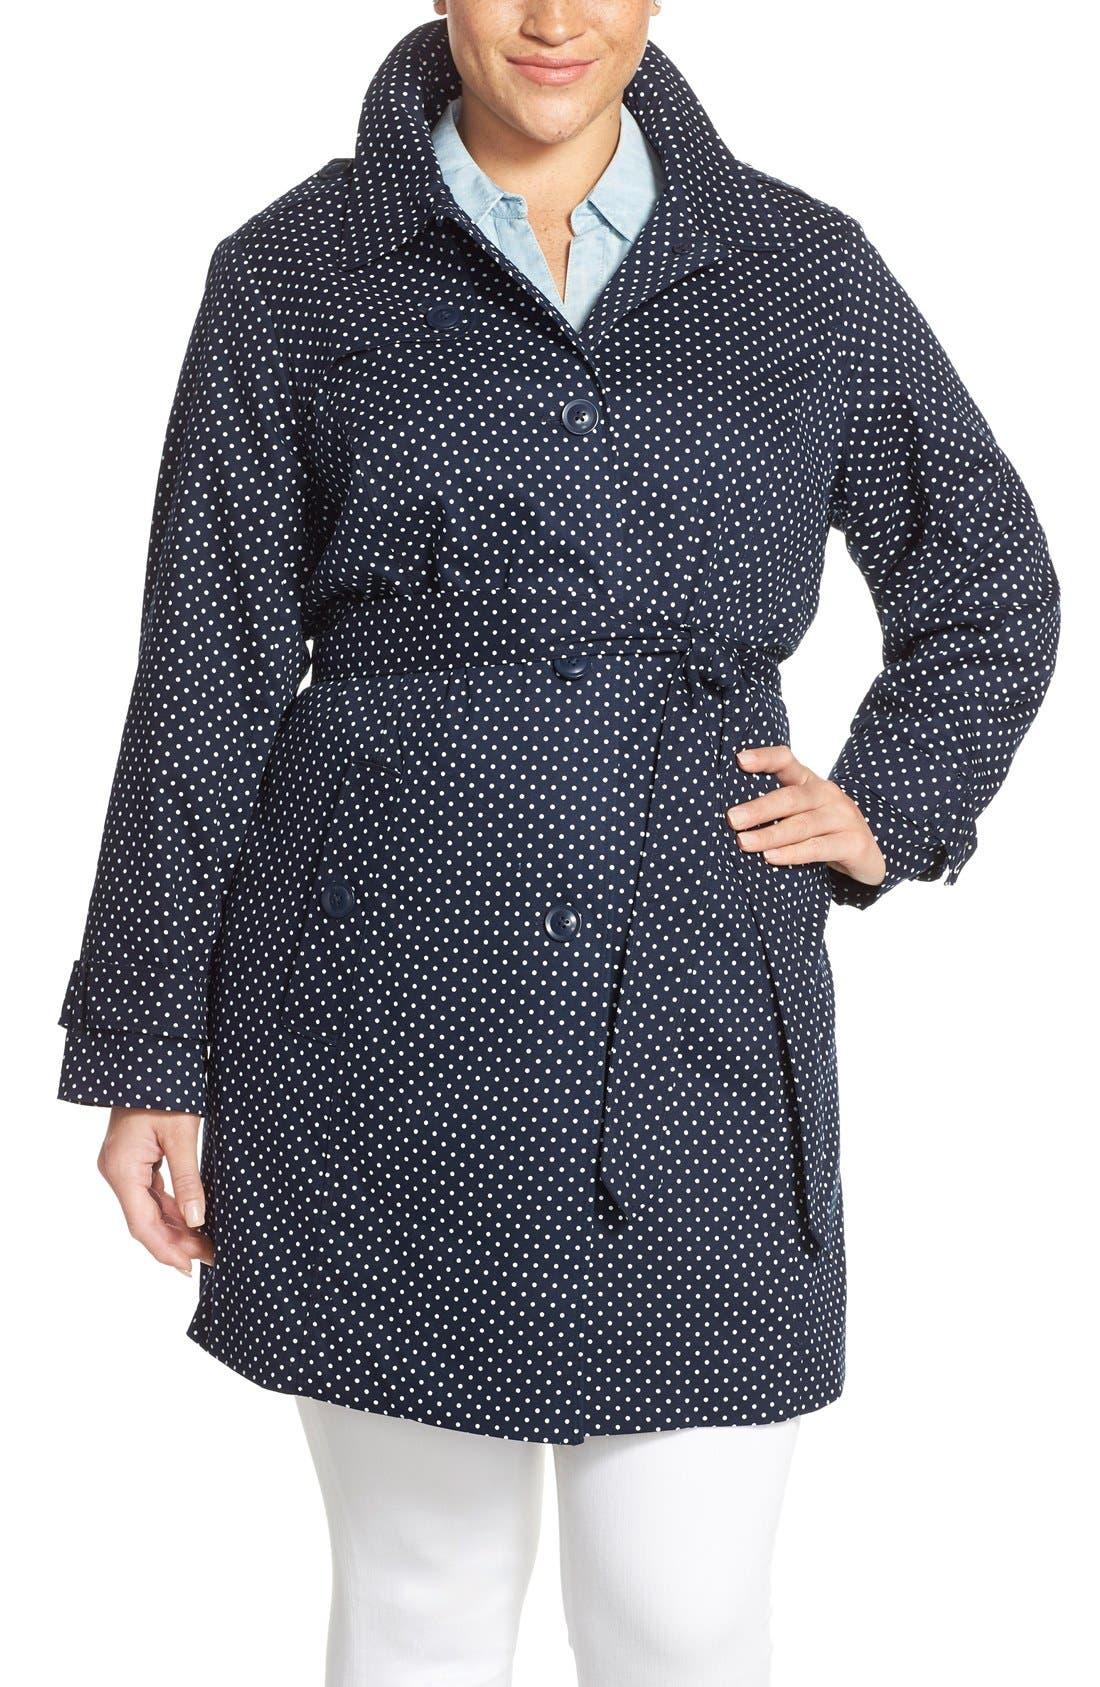 Polka Dot Single Breasted Trench Coat,                         Main,                         color, 410